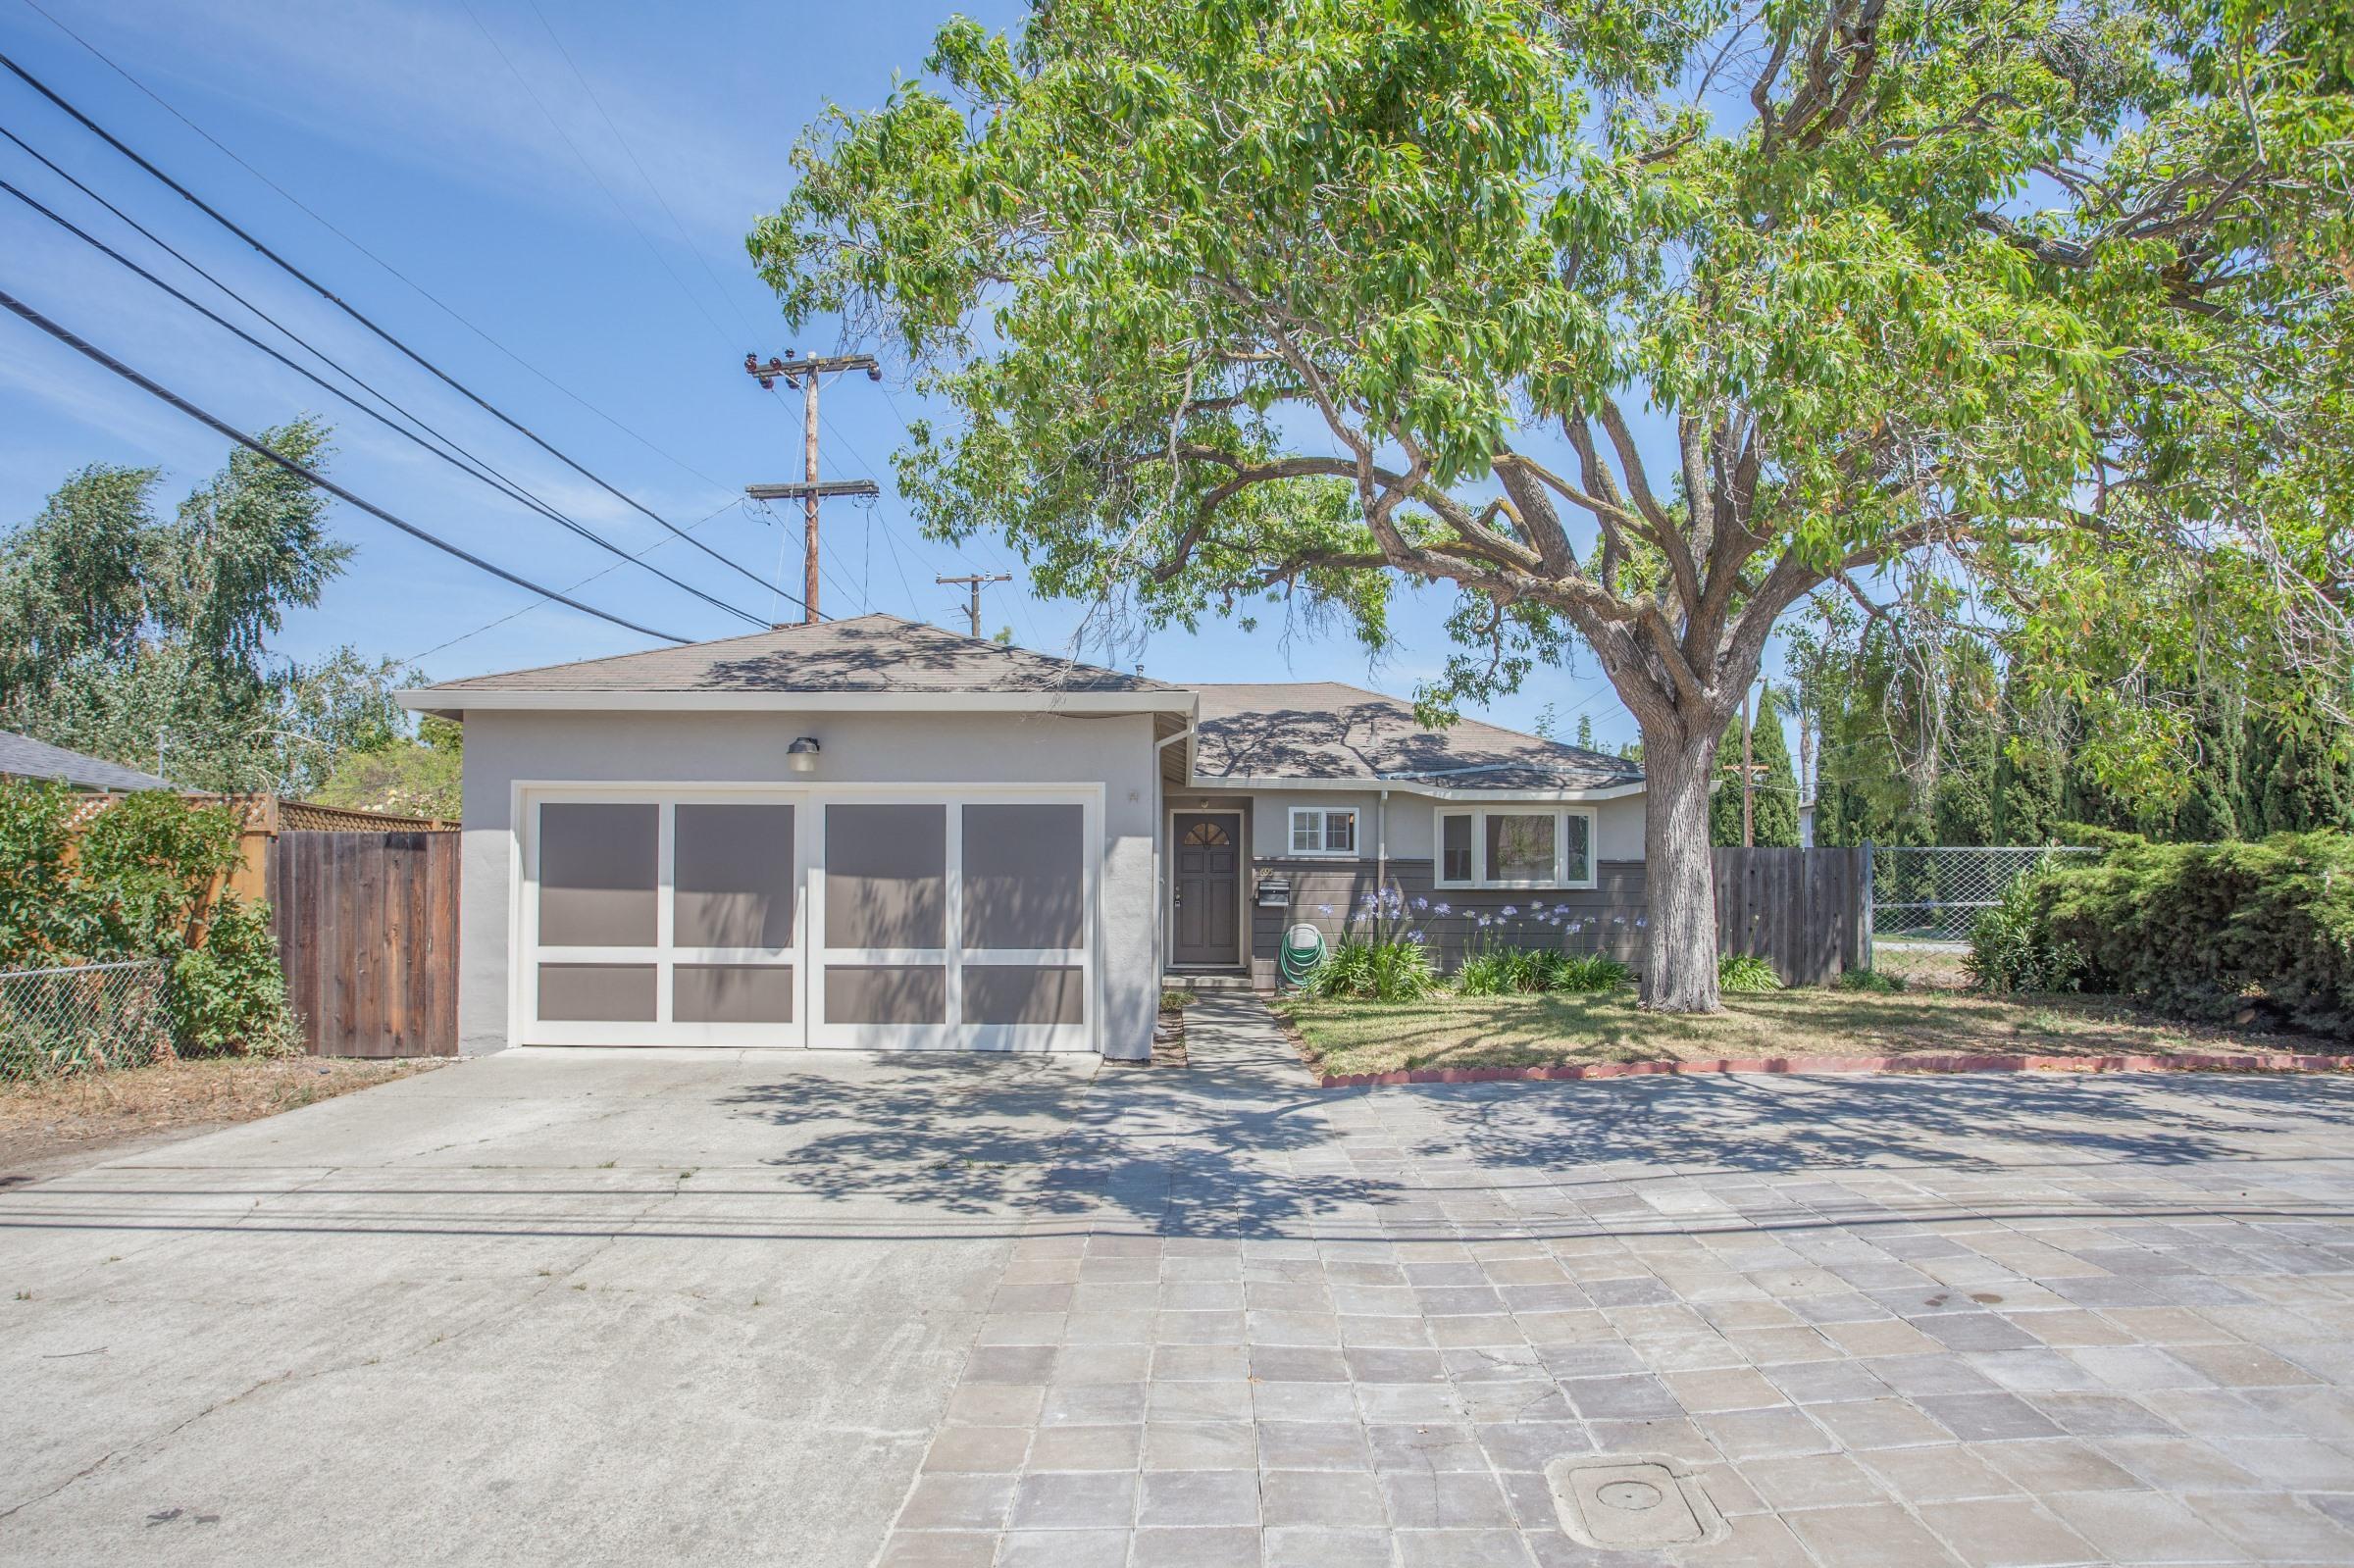 sales property at 1695 Pomeroy Avenue, Santa Clara